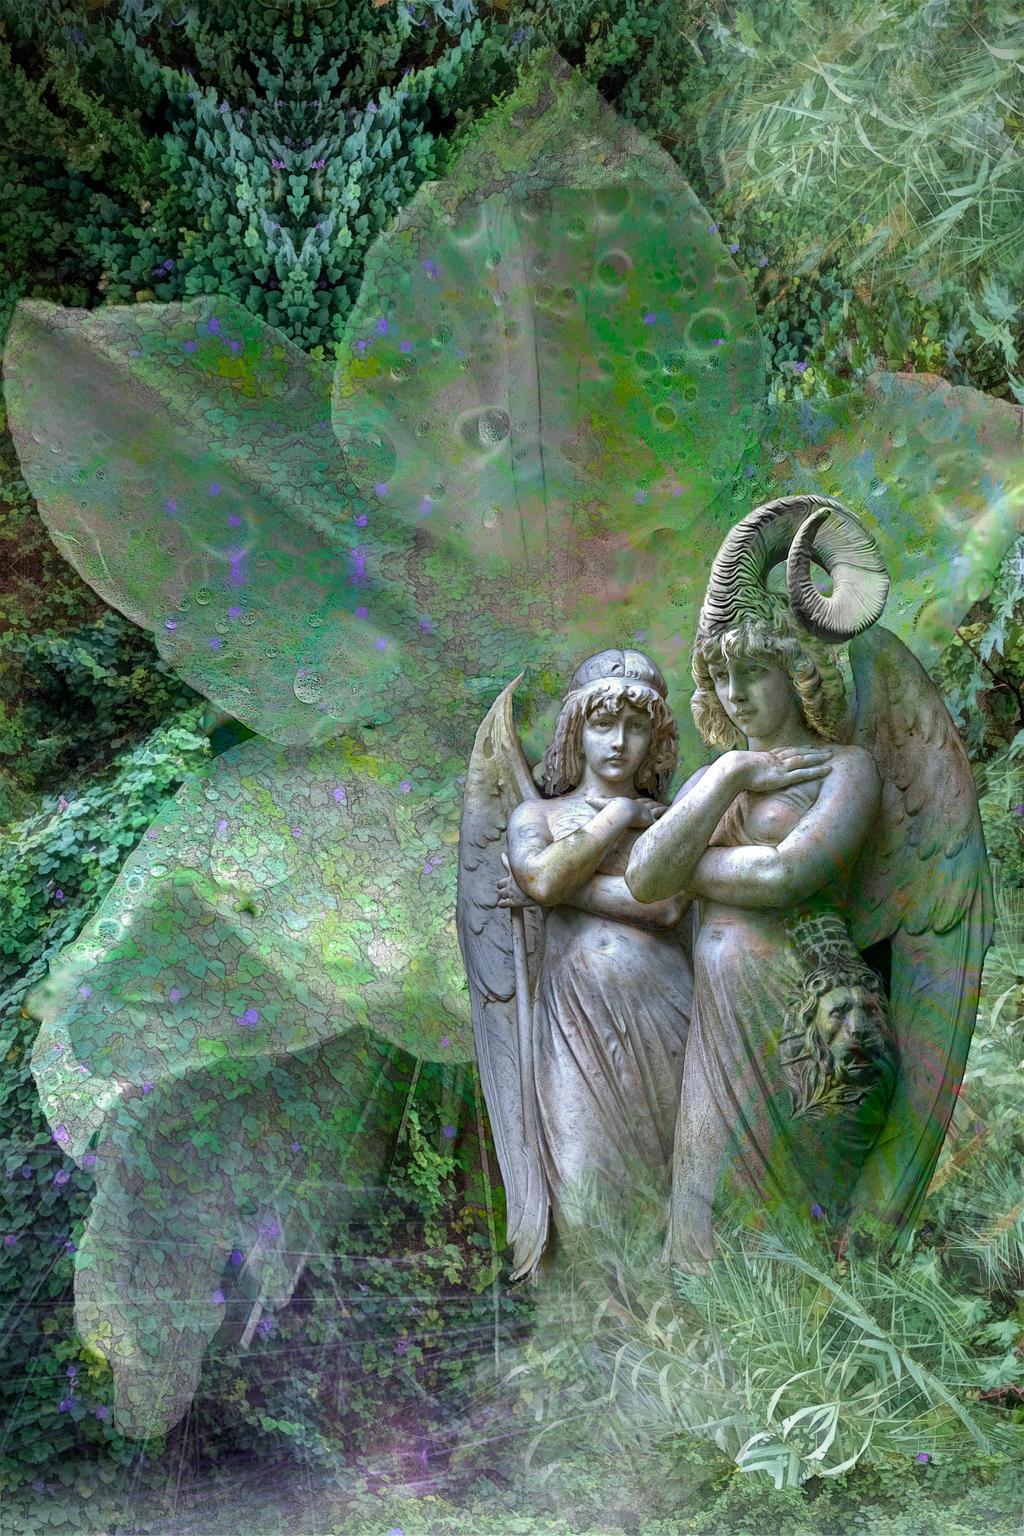 Dating fallen  angels-cover for J. Boekestein by taisteng